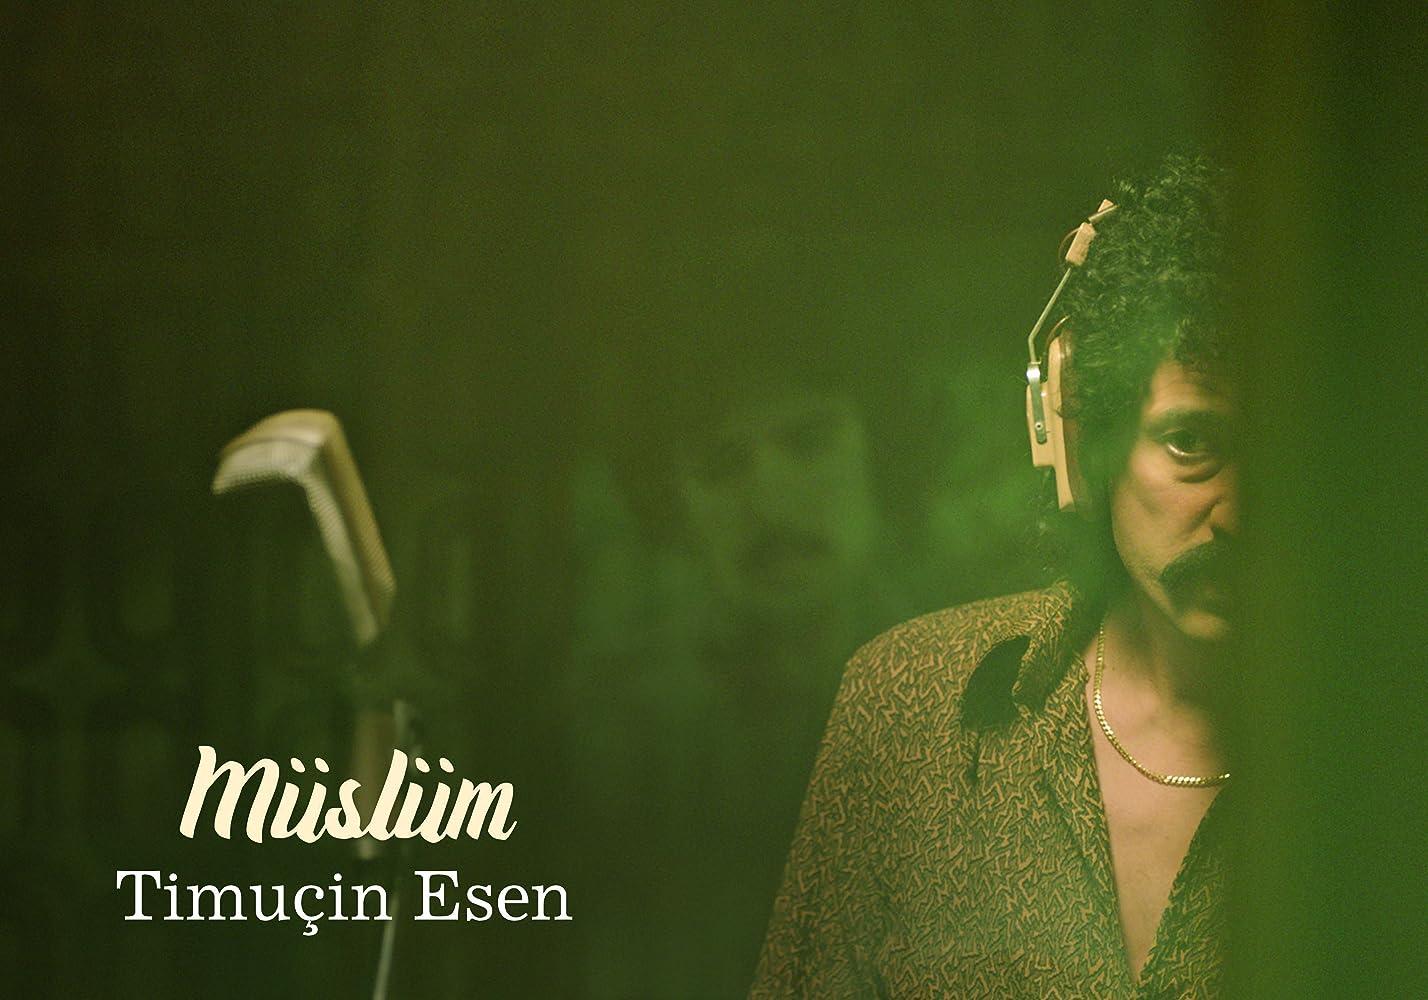 Müslüm filmi Timuçin Esen